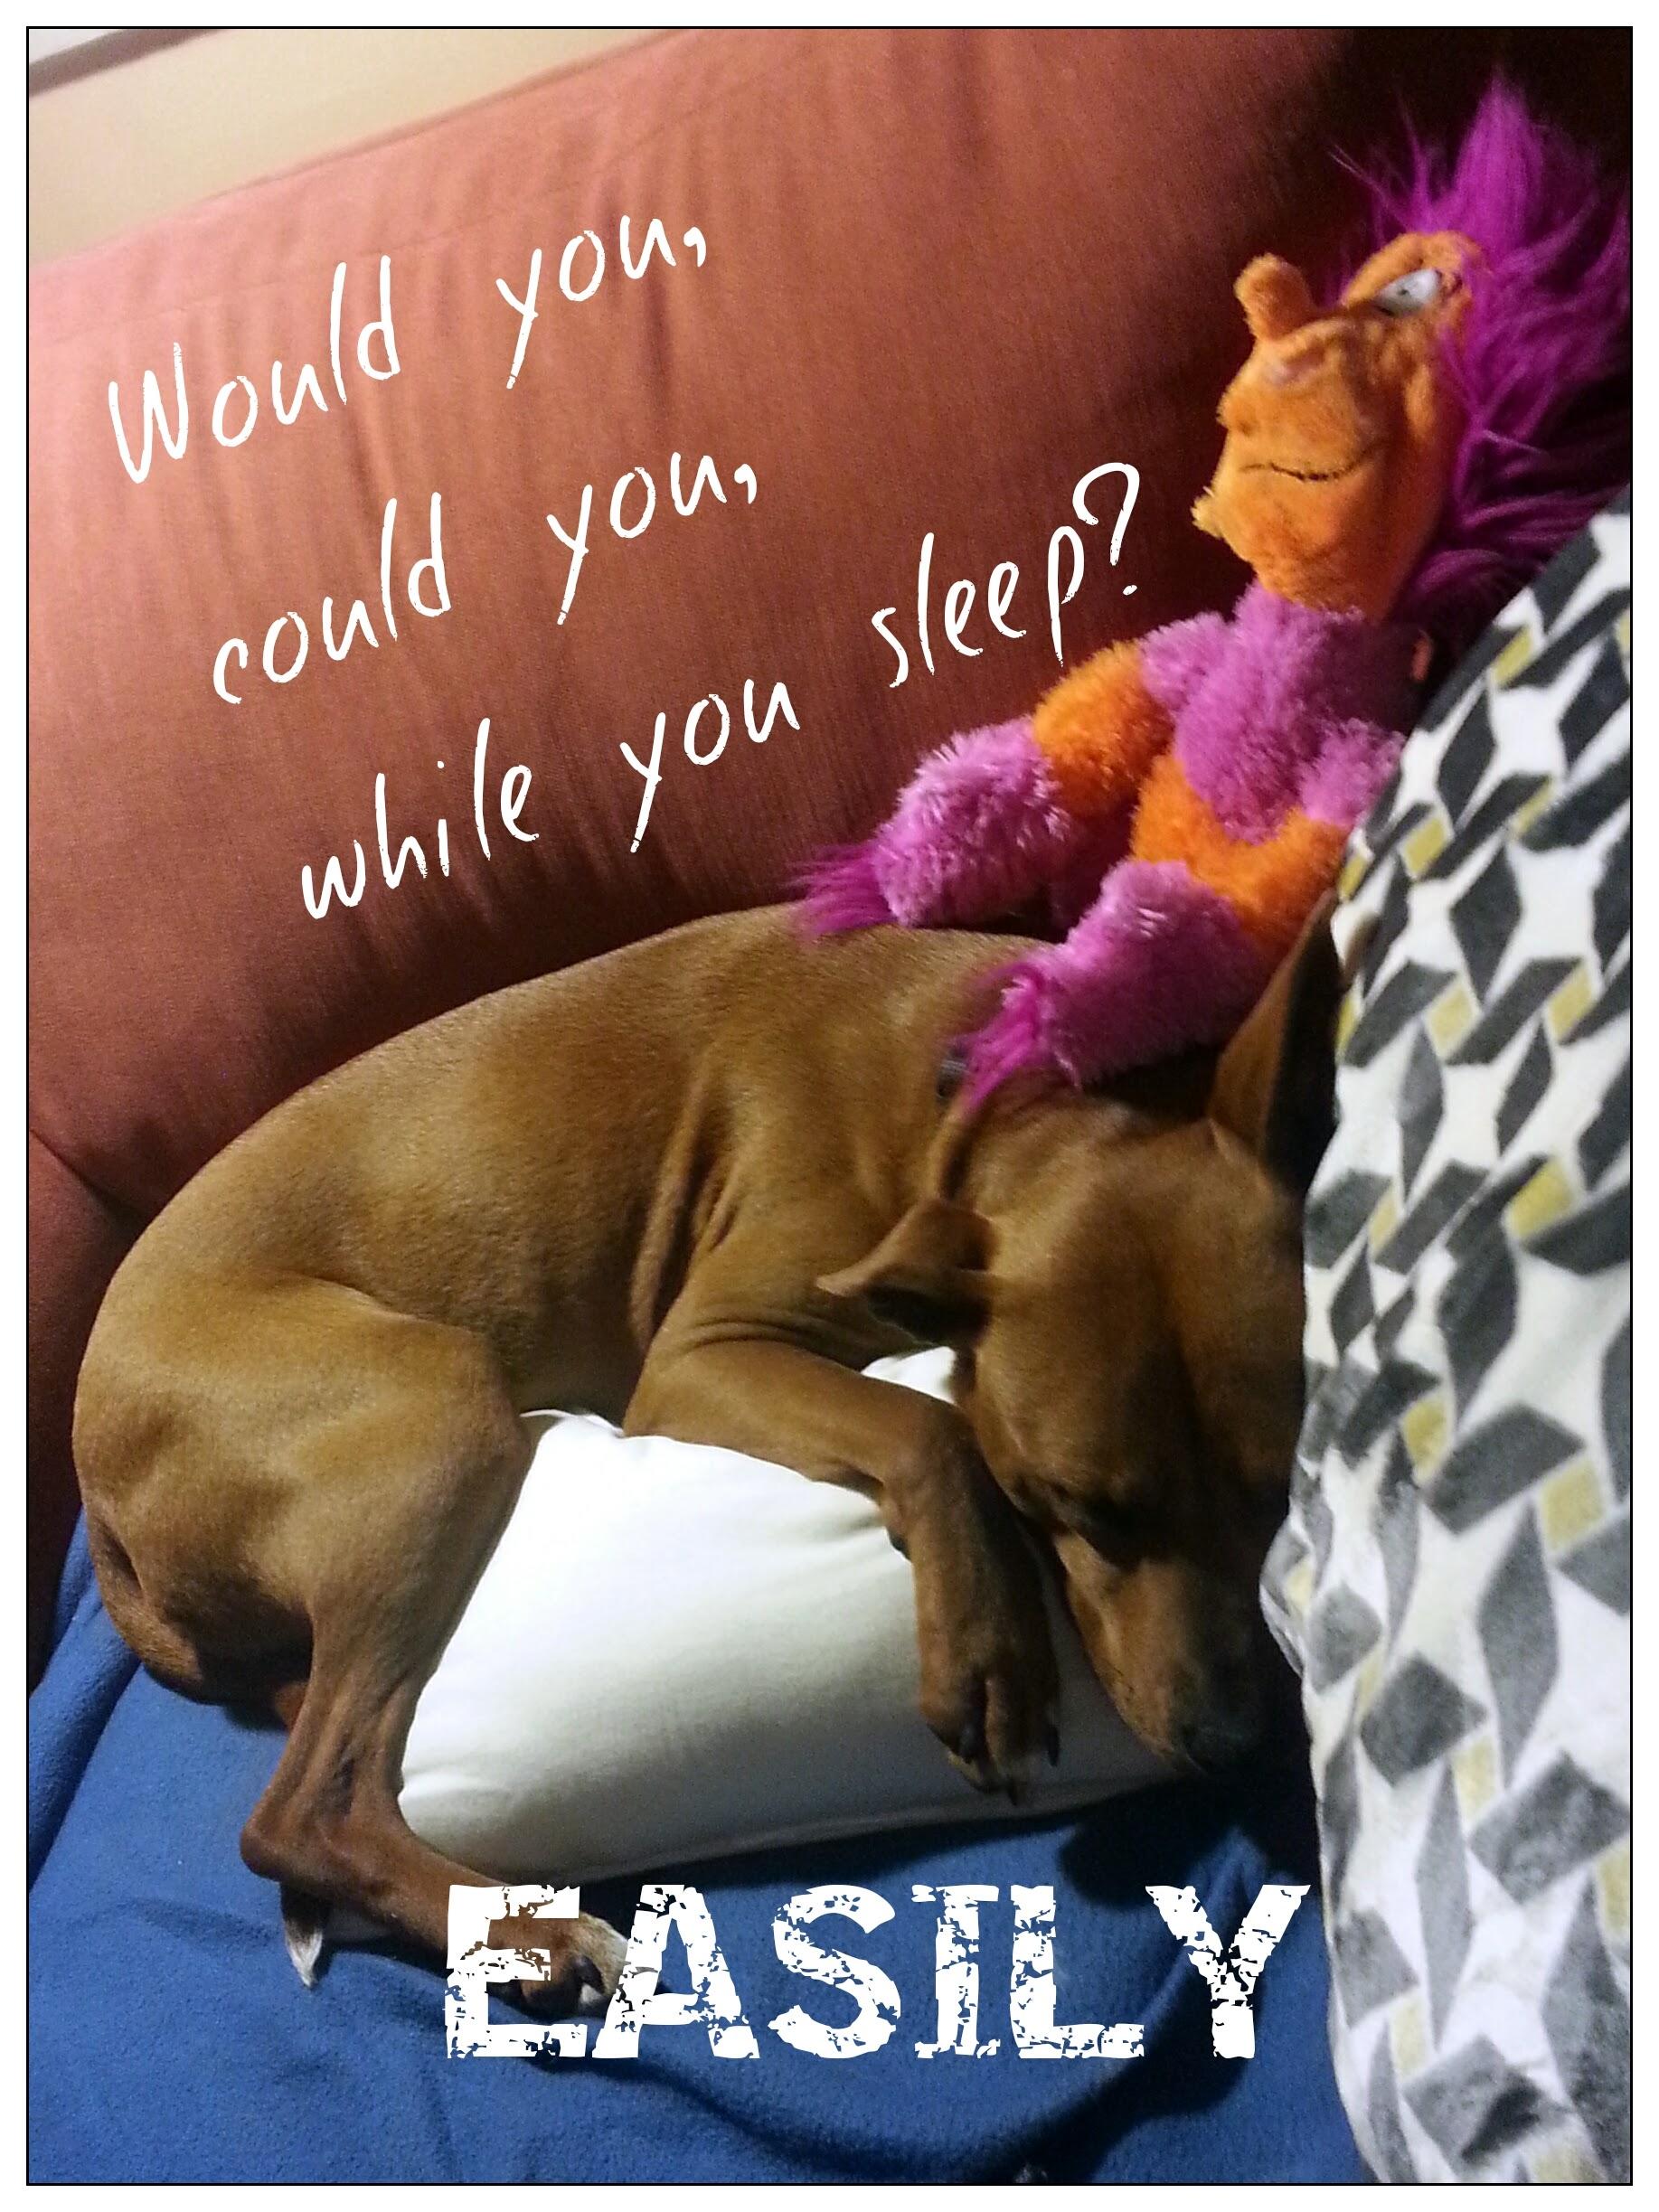 Would you, could you, while you sleep?     EASILY    - Naya